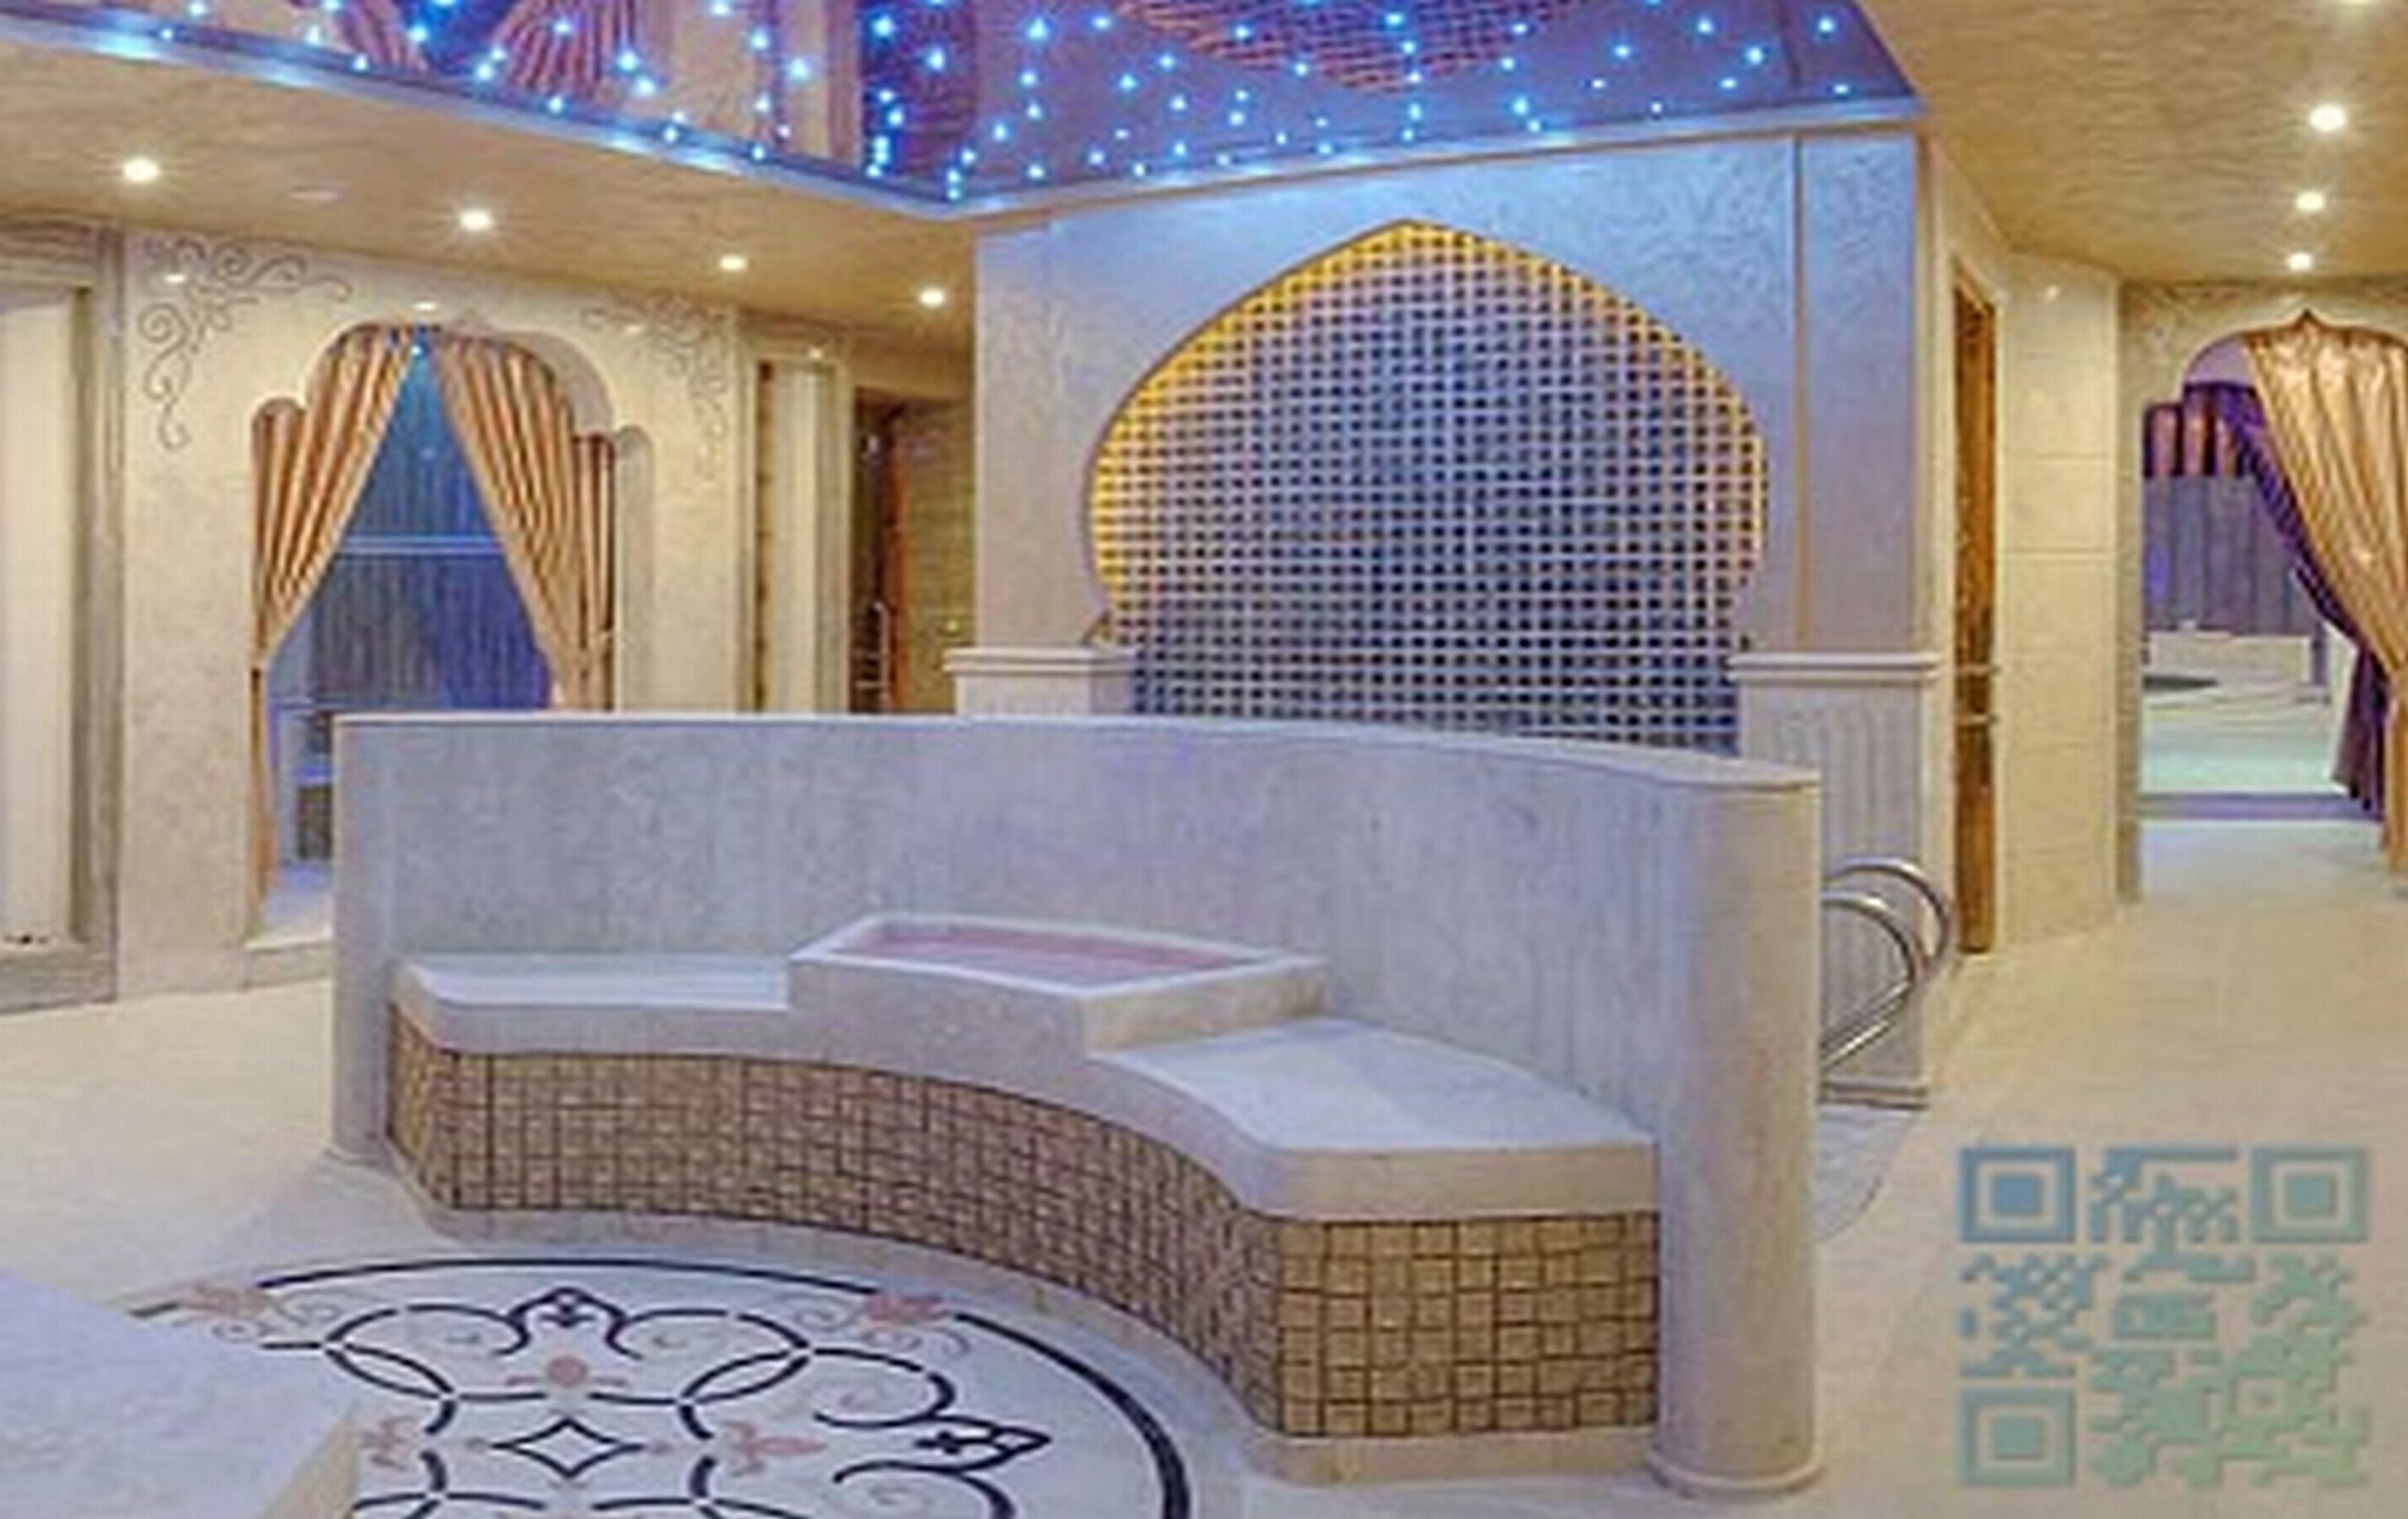 Royal Hotel Darvishi (رویال هتل دارویشی)